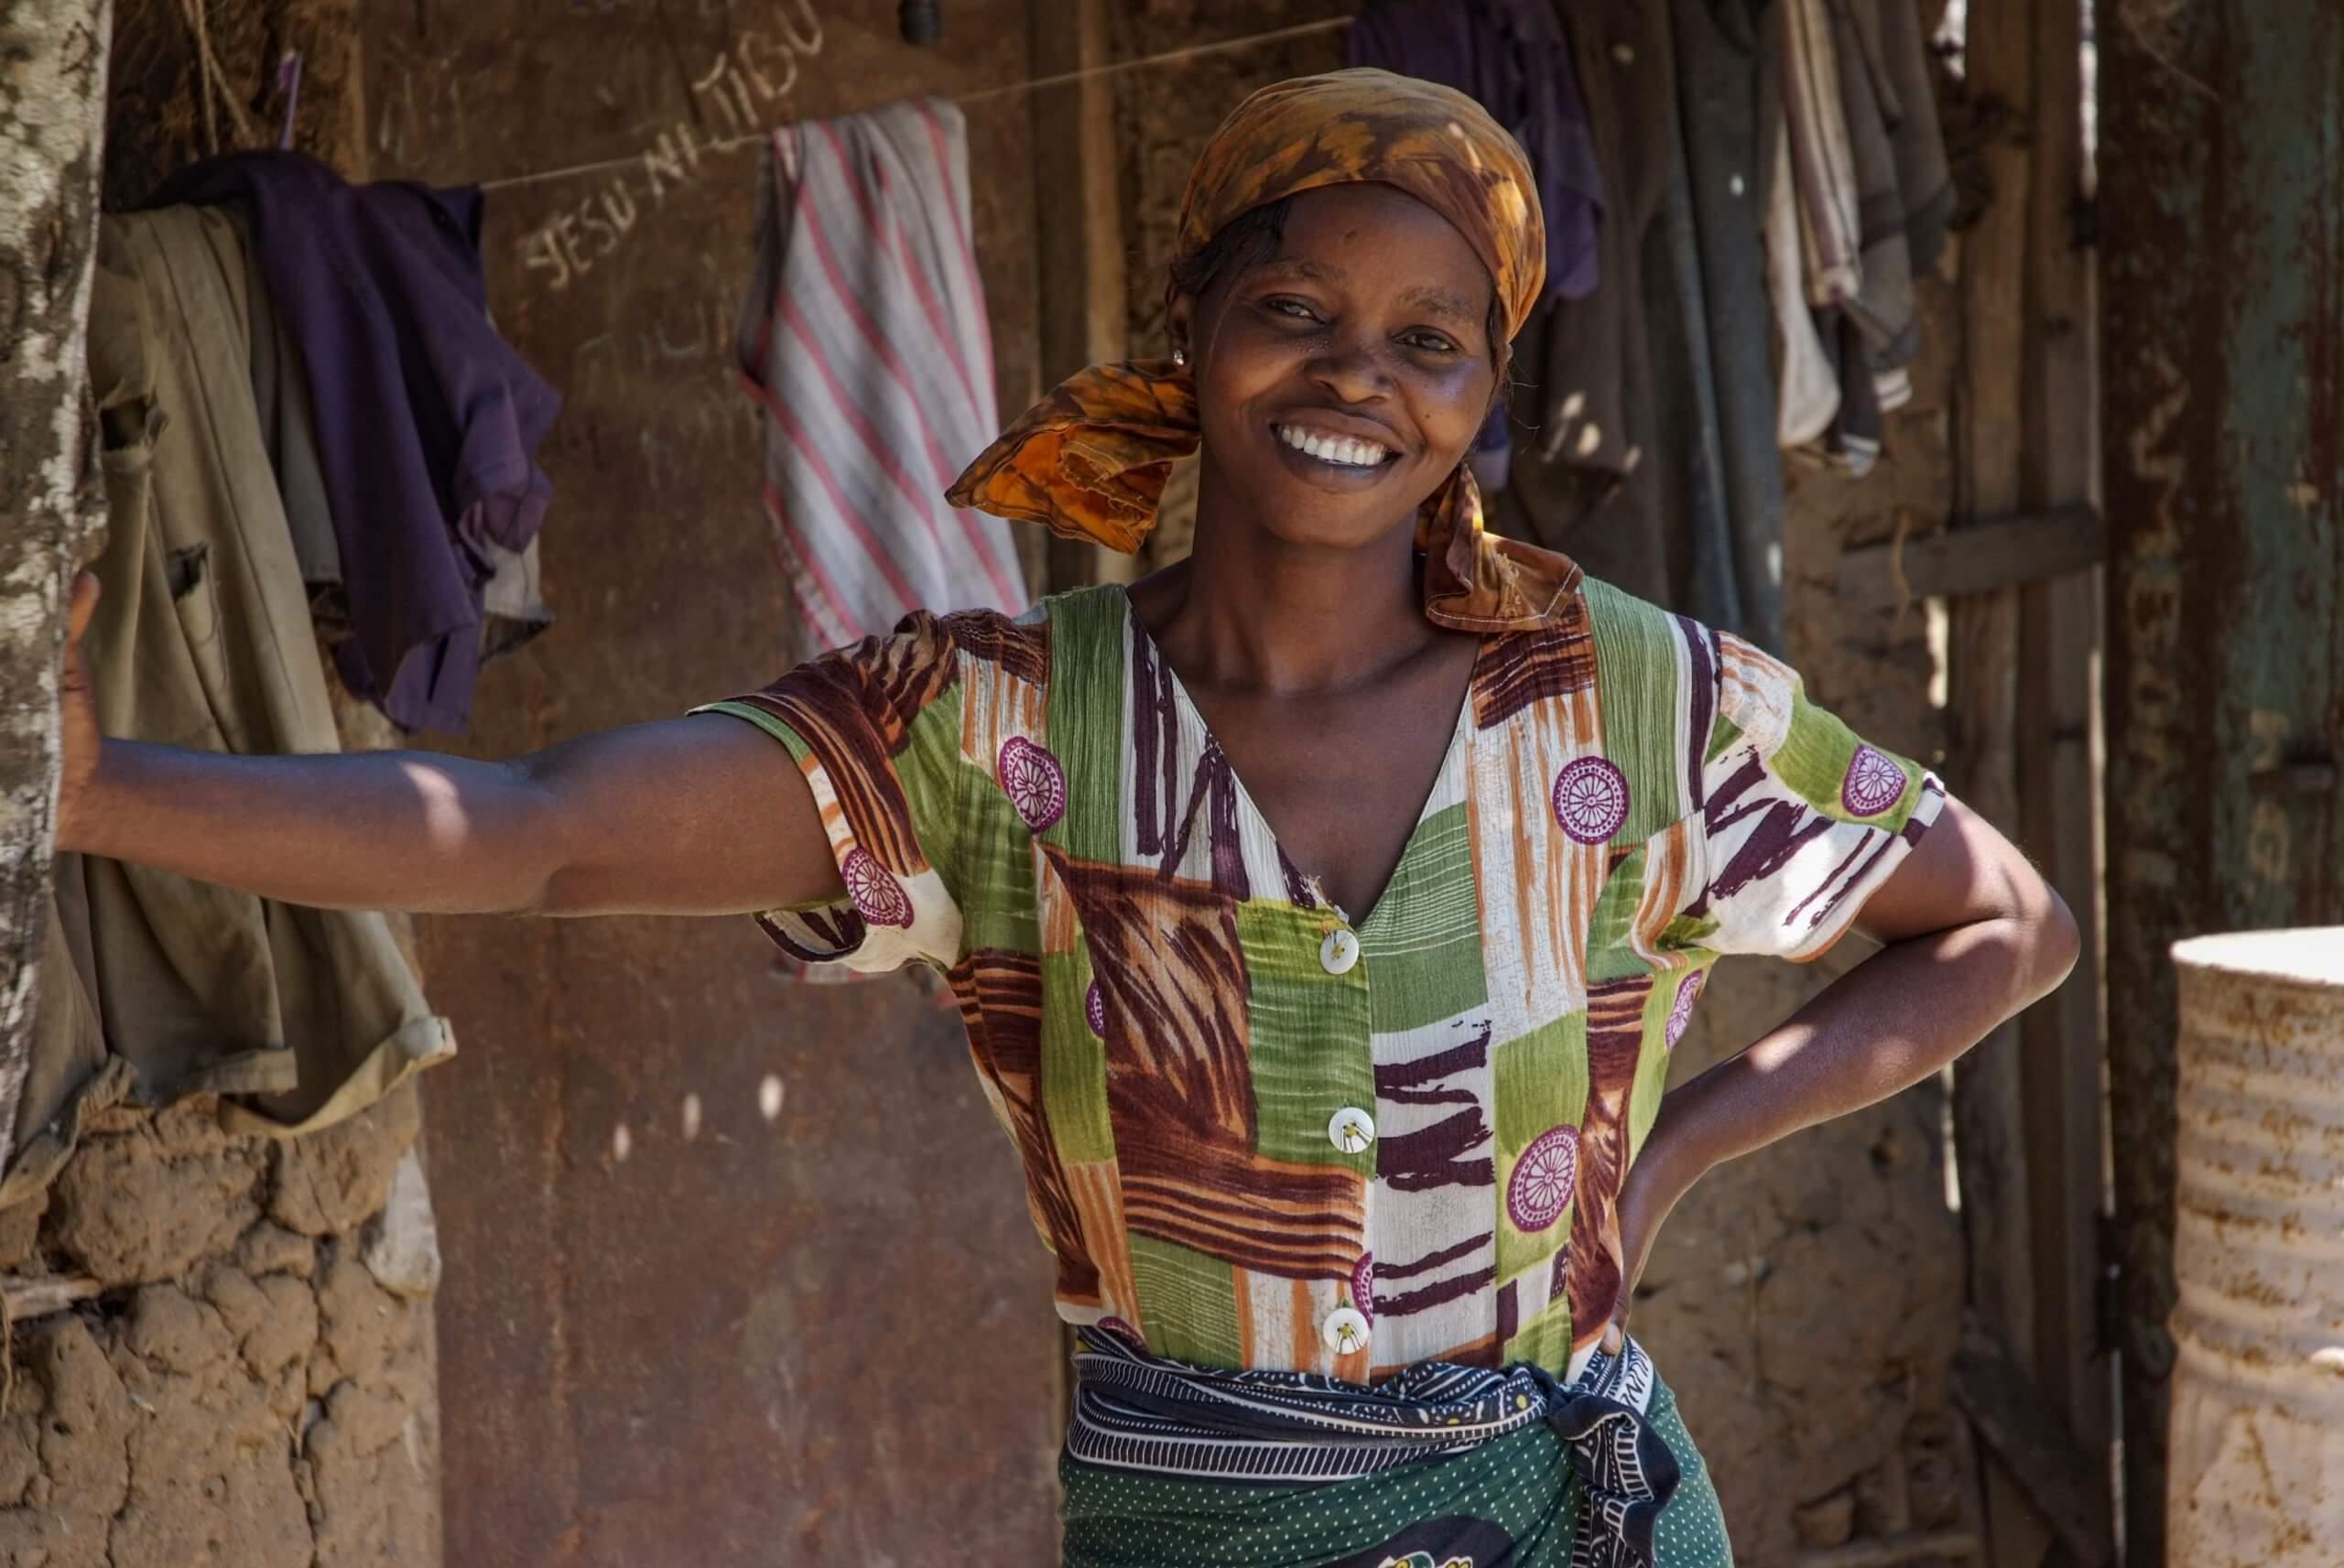 07 01 boerin trotsevrouw Agnes Mahmudu tanzania 3607 scaled